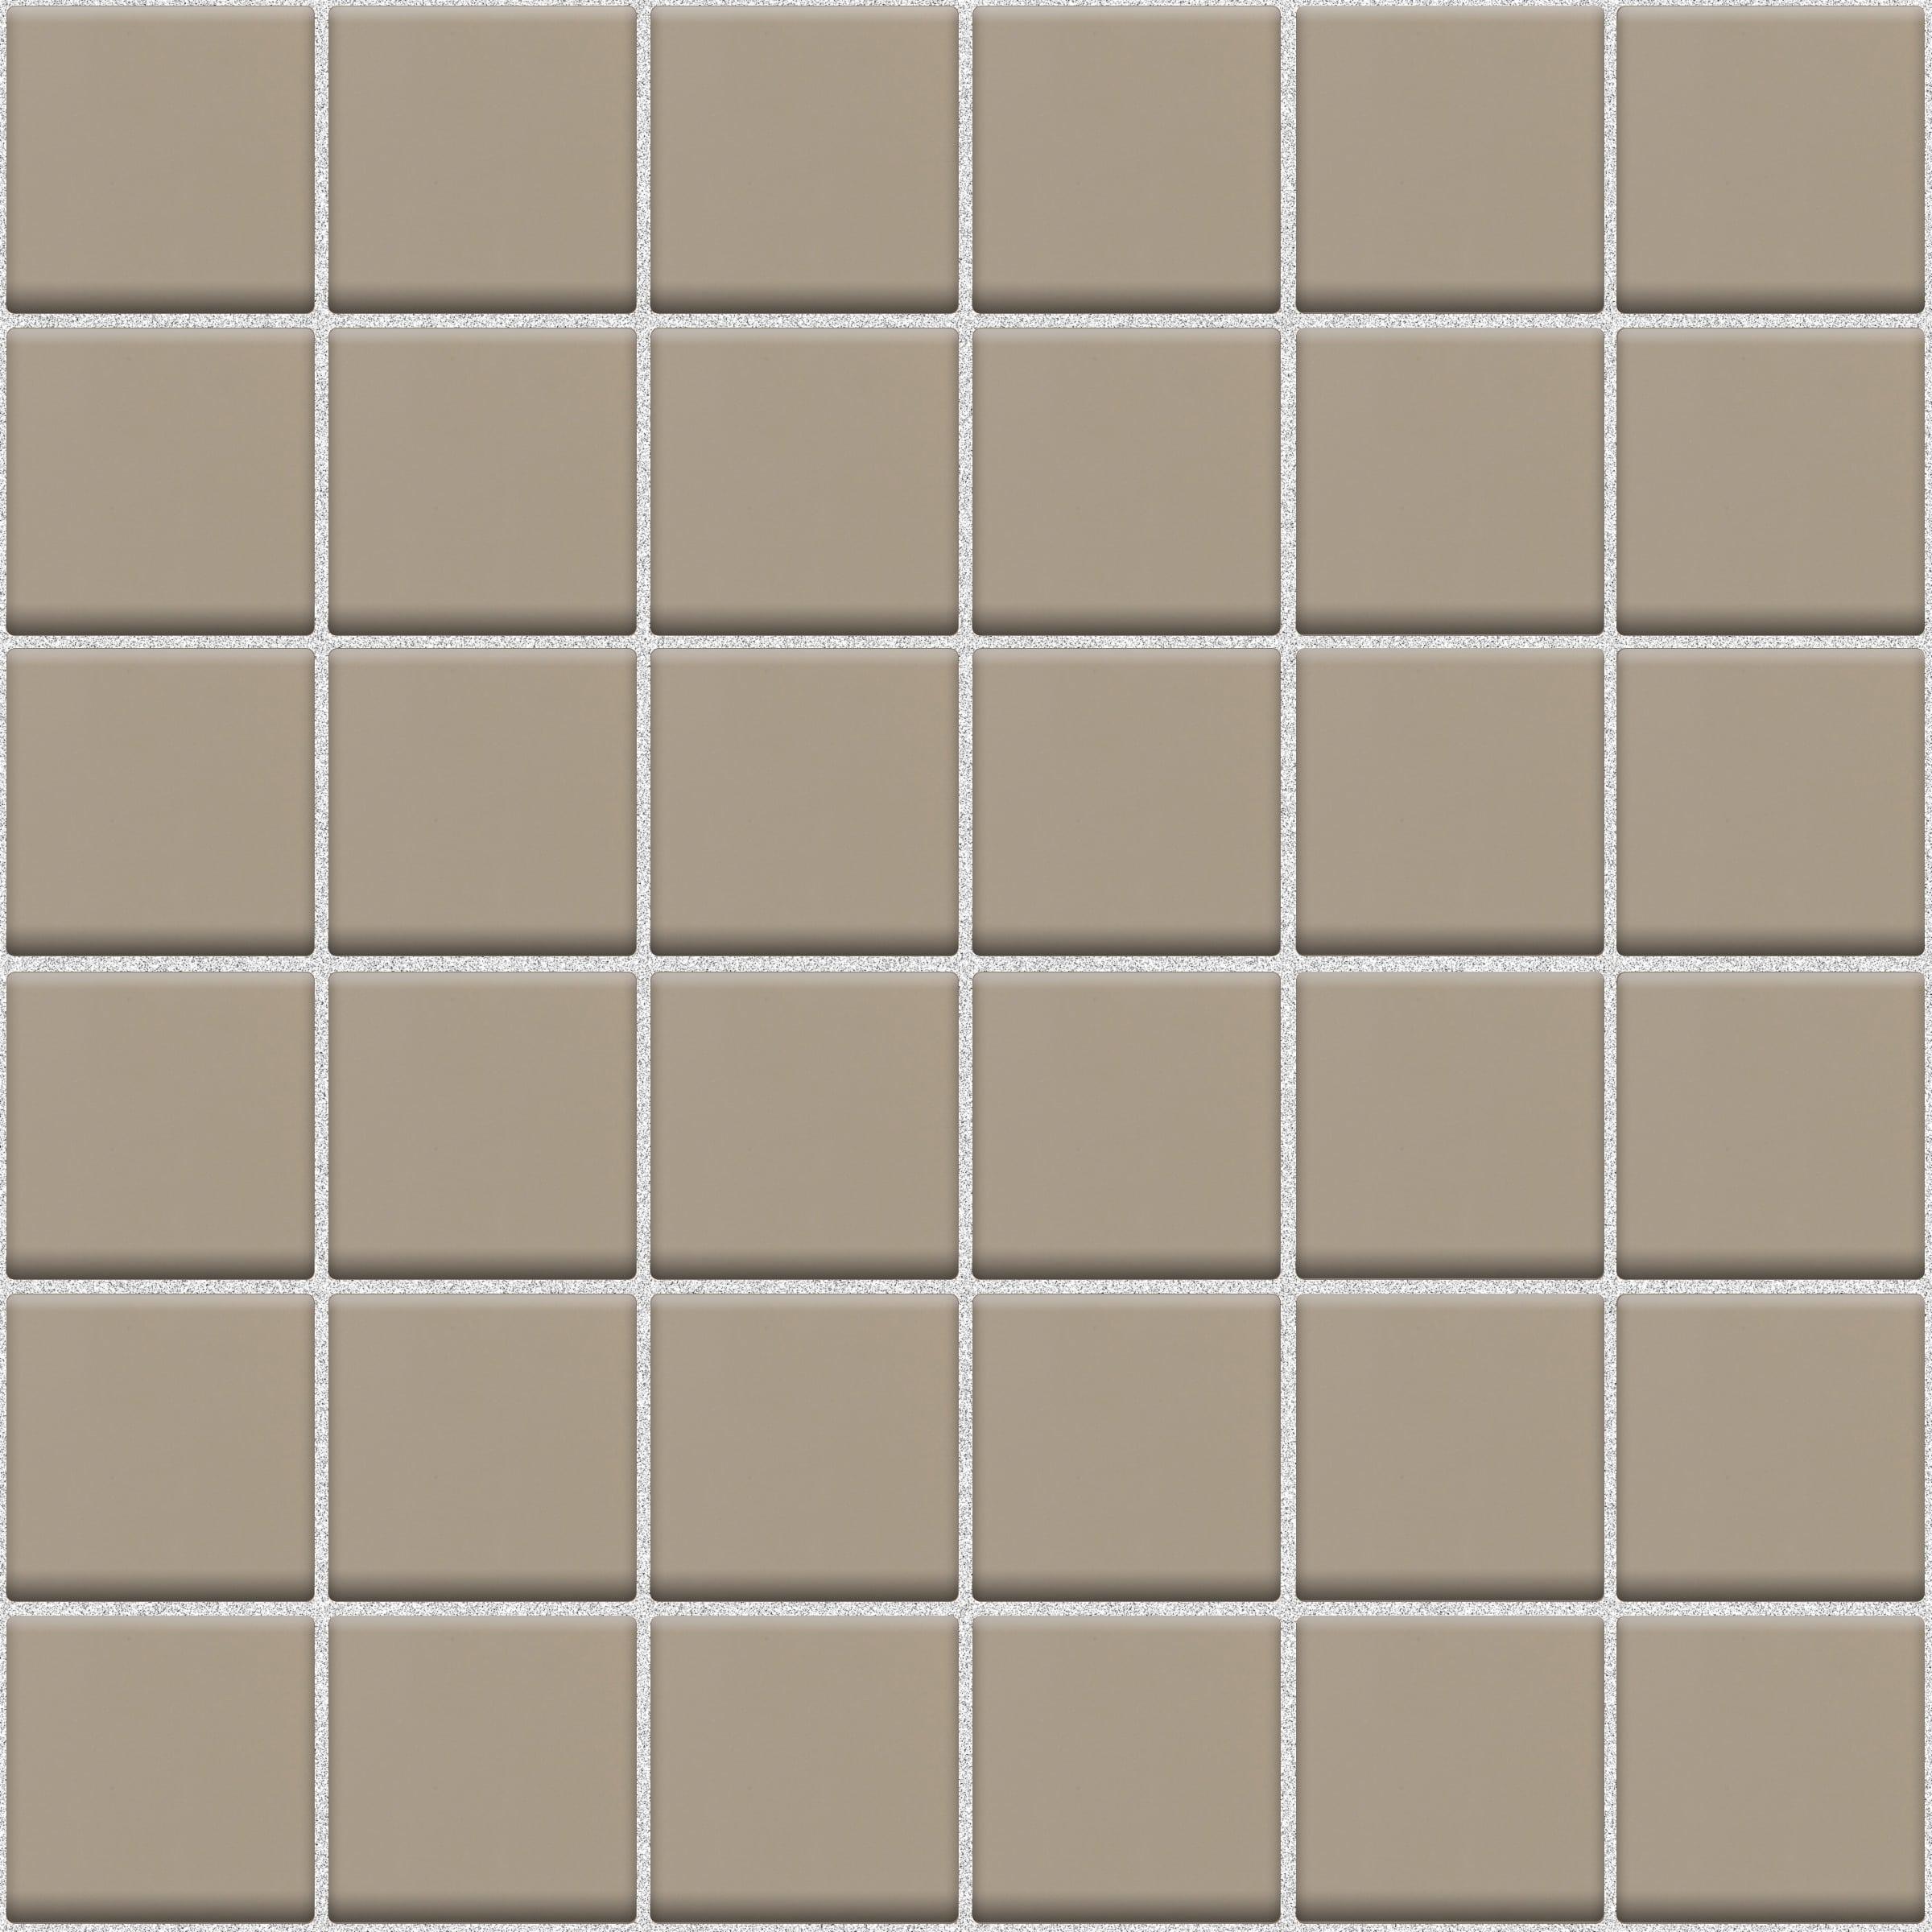 Ceramic Tile Daltile Image Collections Castle Metals Daltile Heathland Ceramic Tile White Rock